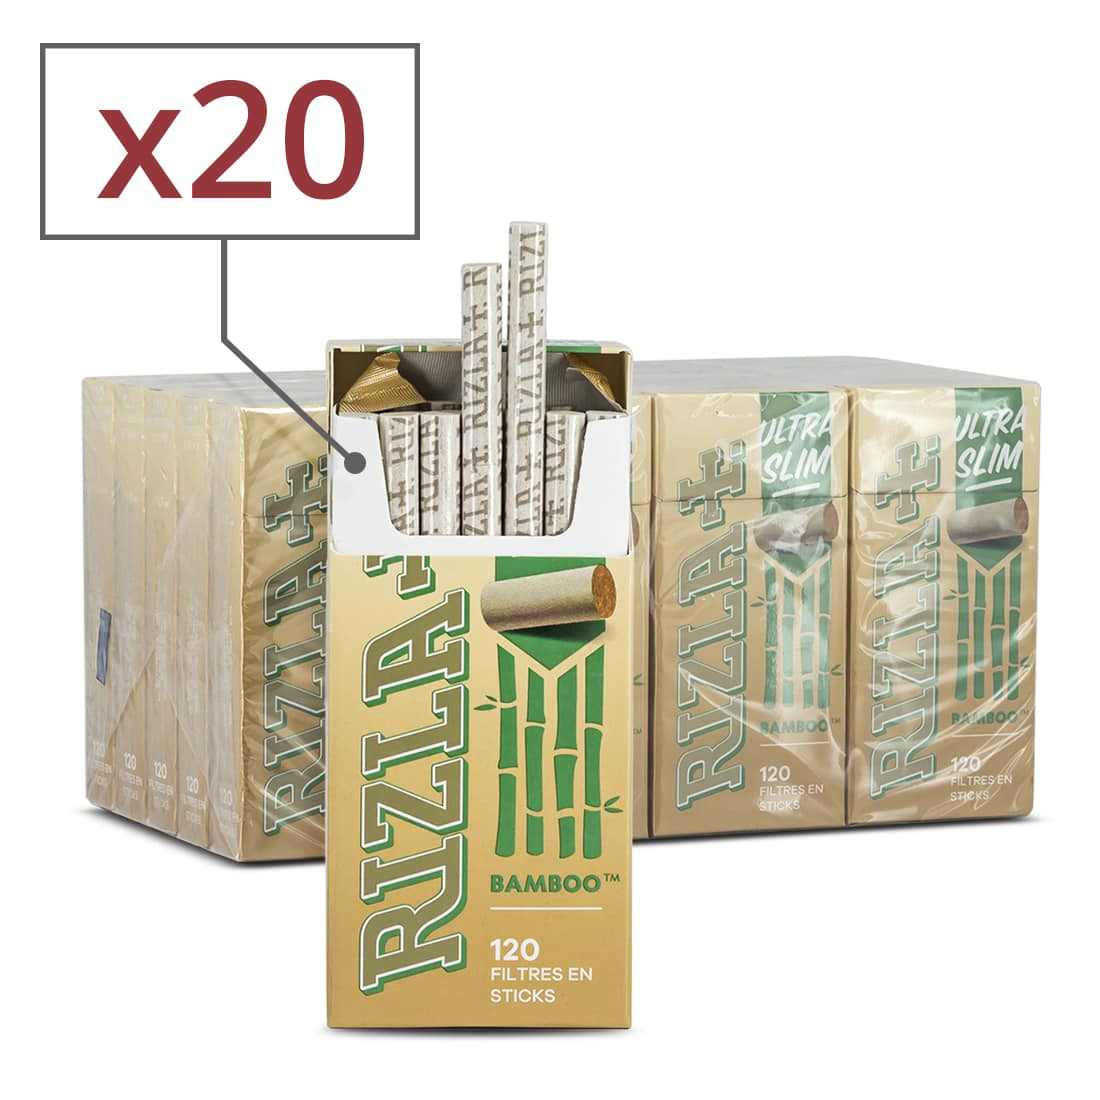 Photo de Filtres Rizla + Ultra Slim en sticks Bamboo x 20 Boites